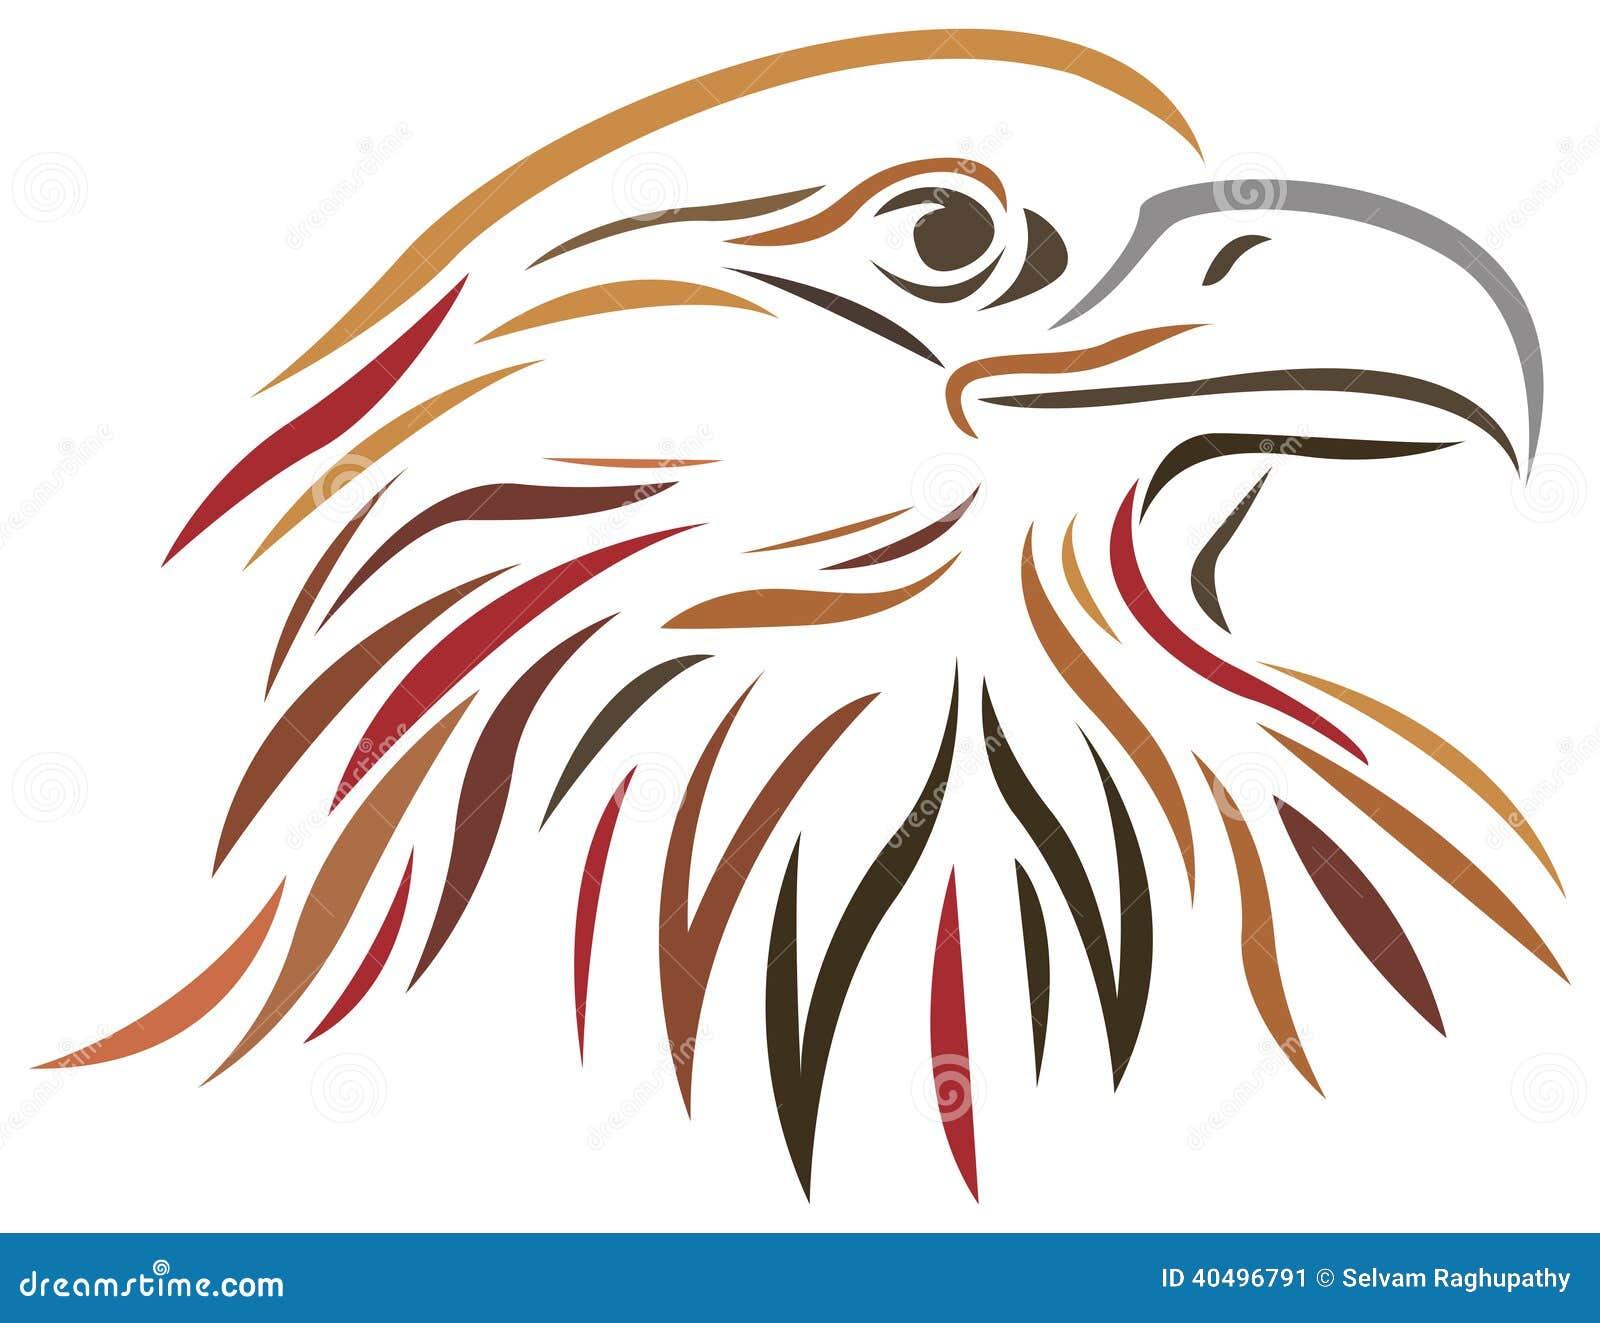 Line Art Brush : Falcon stock vector image